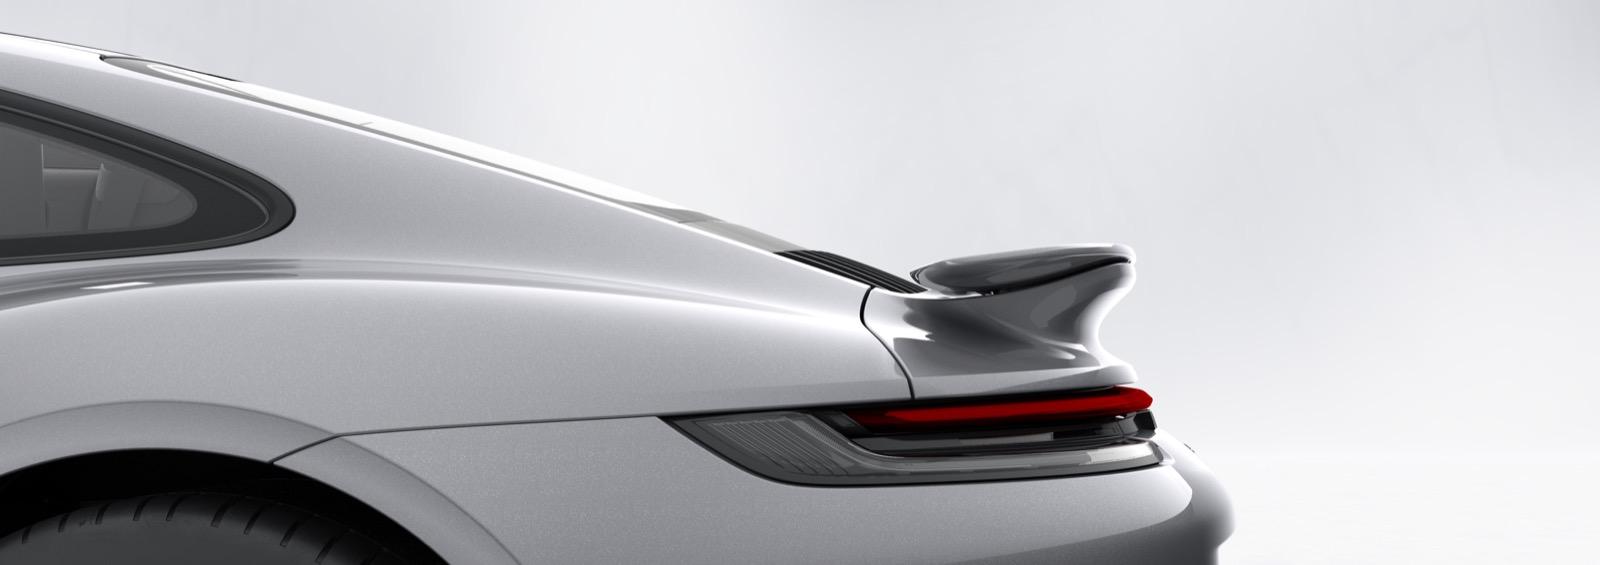 Porsche 911 Turbo 7